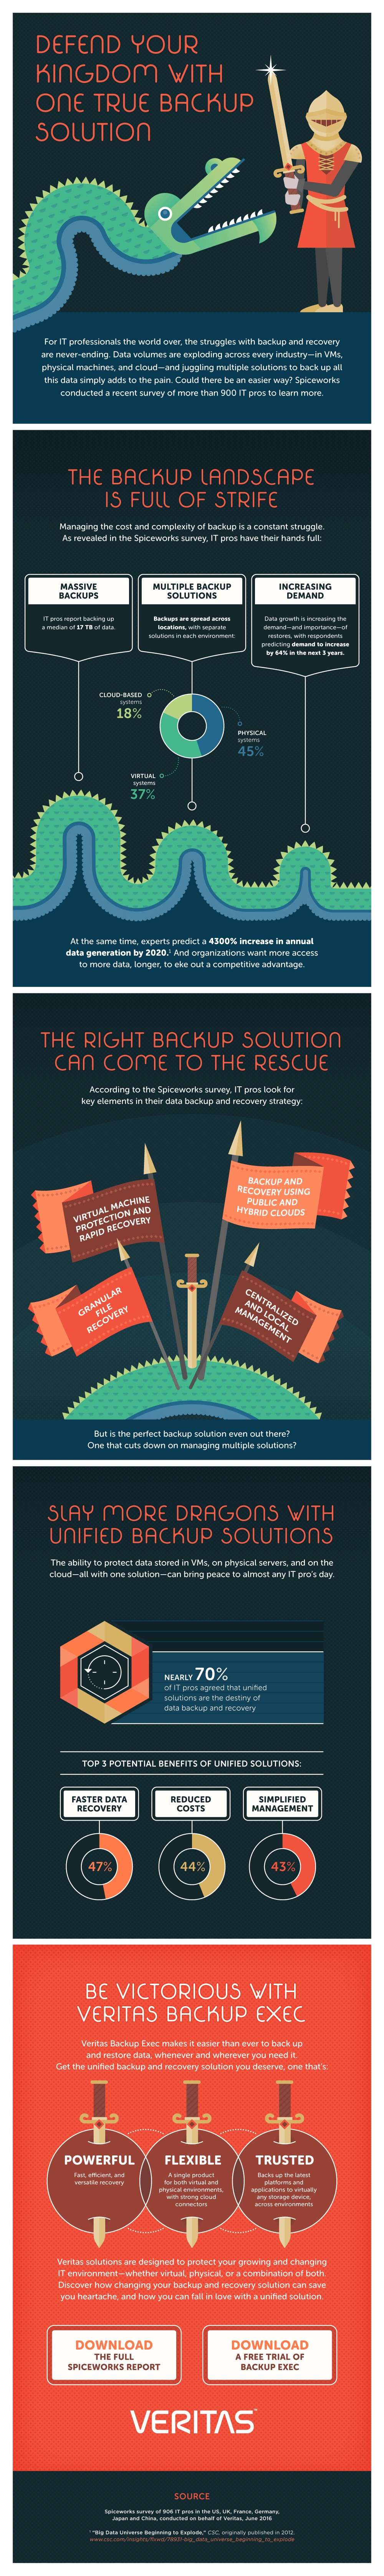 One True Backup Solution Infographic | Veritas, Spiceworks | Makemark